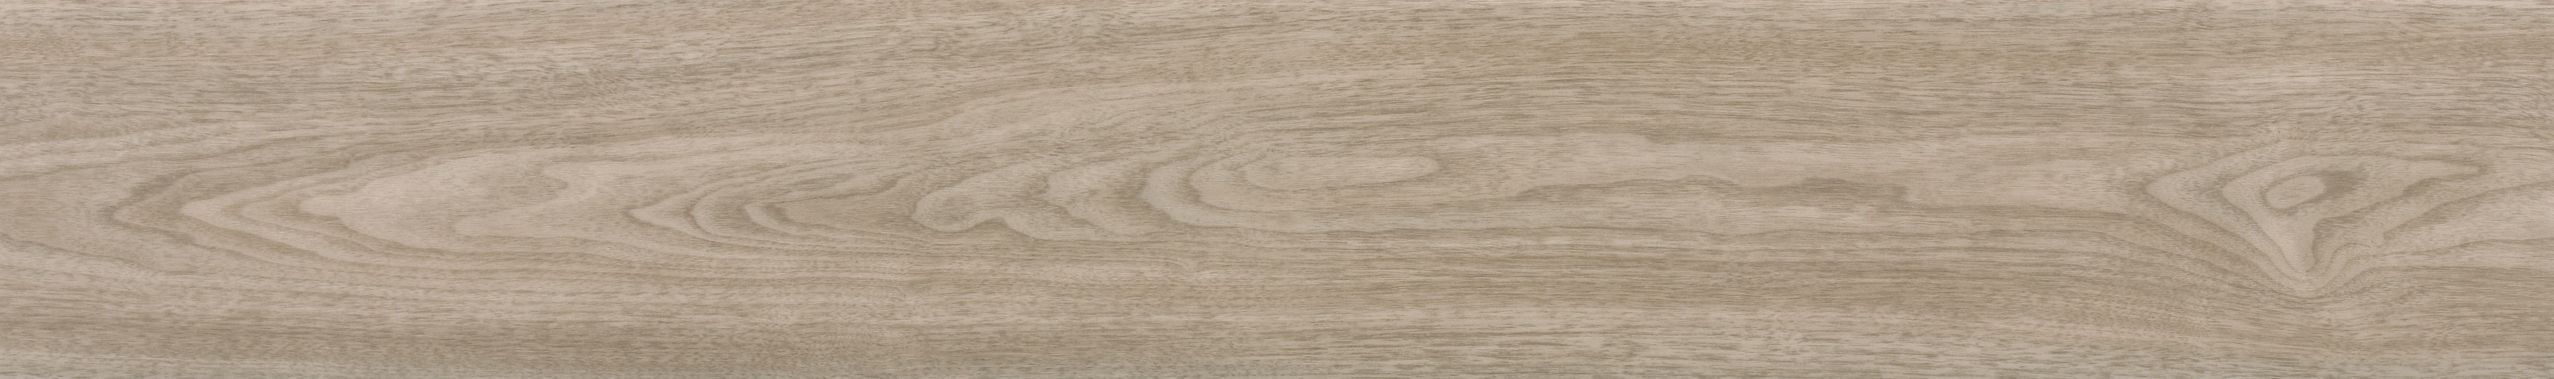 Panele winylowe LVT modulari ® WOOD DRYBACK 19,6 x 132 cm 28225